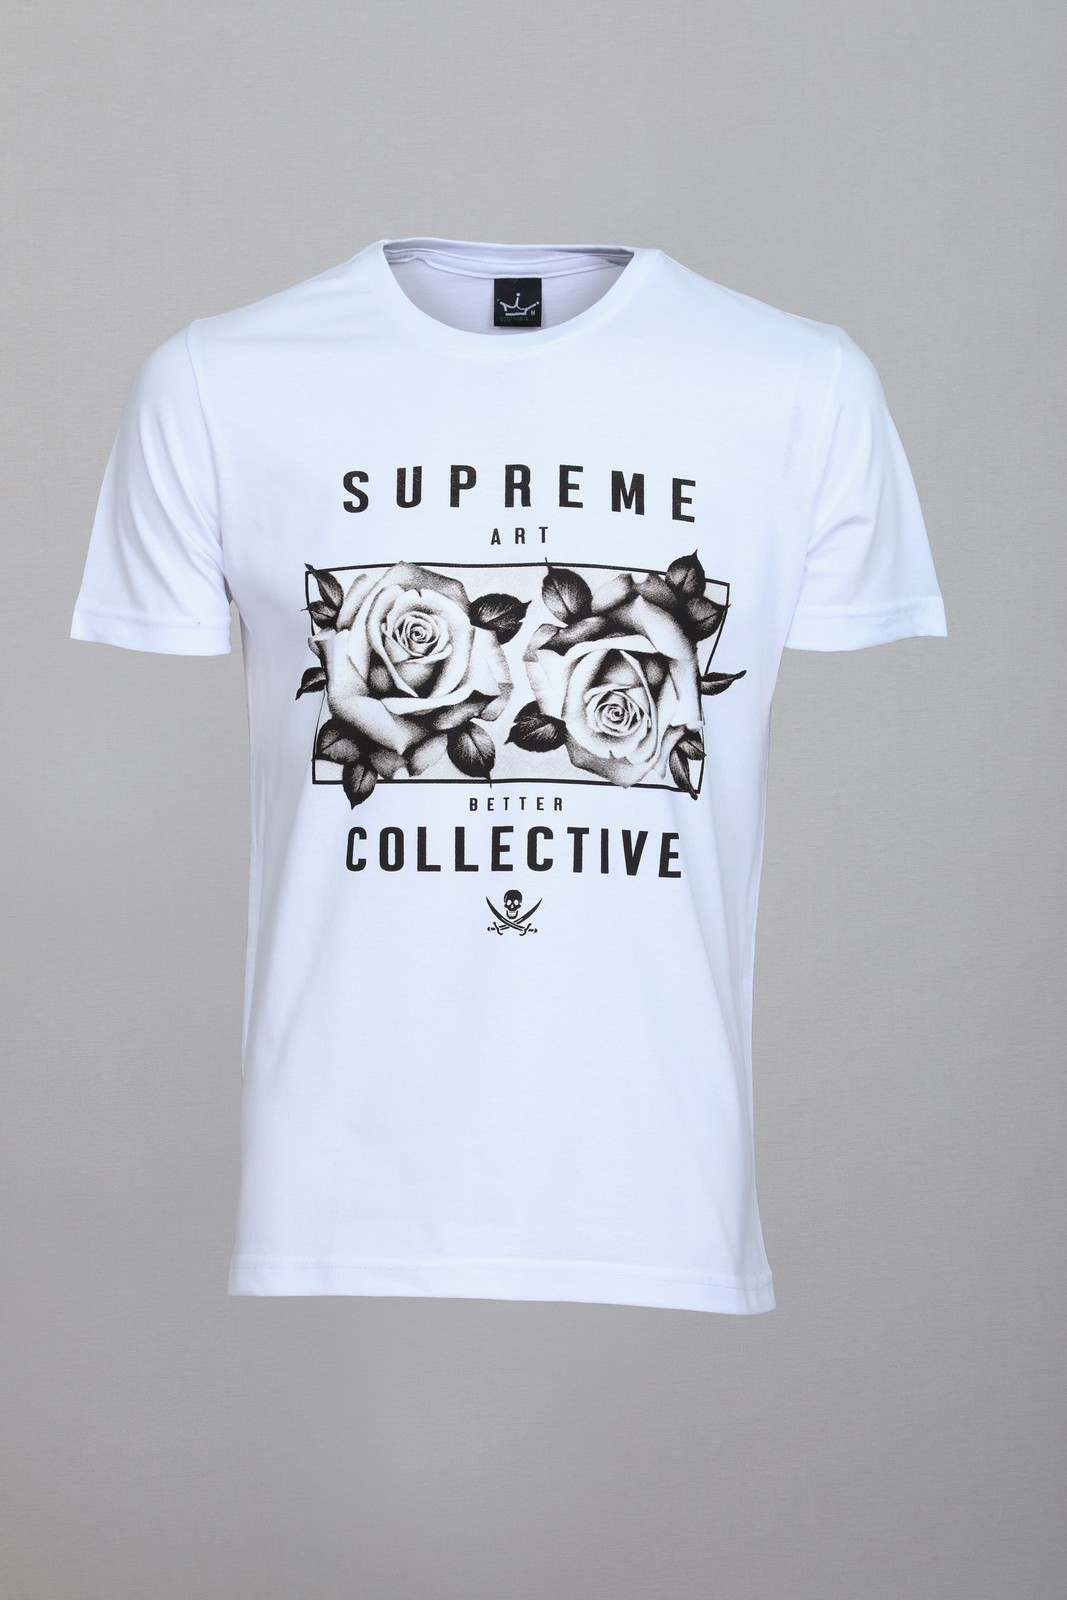 Camiseta CoolWave Supreme Collective